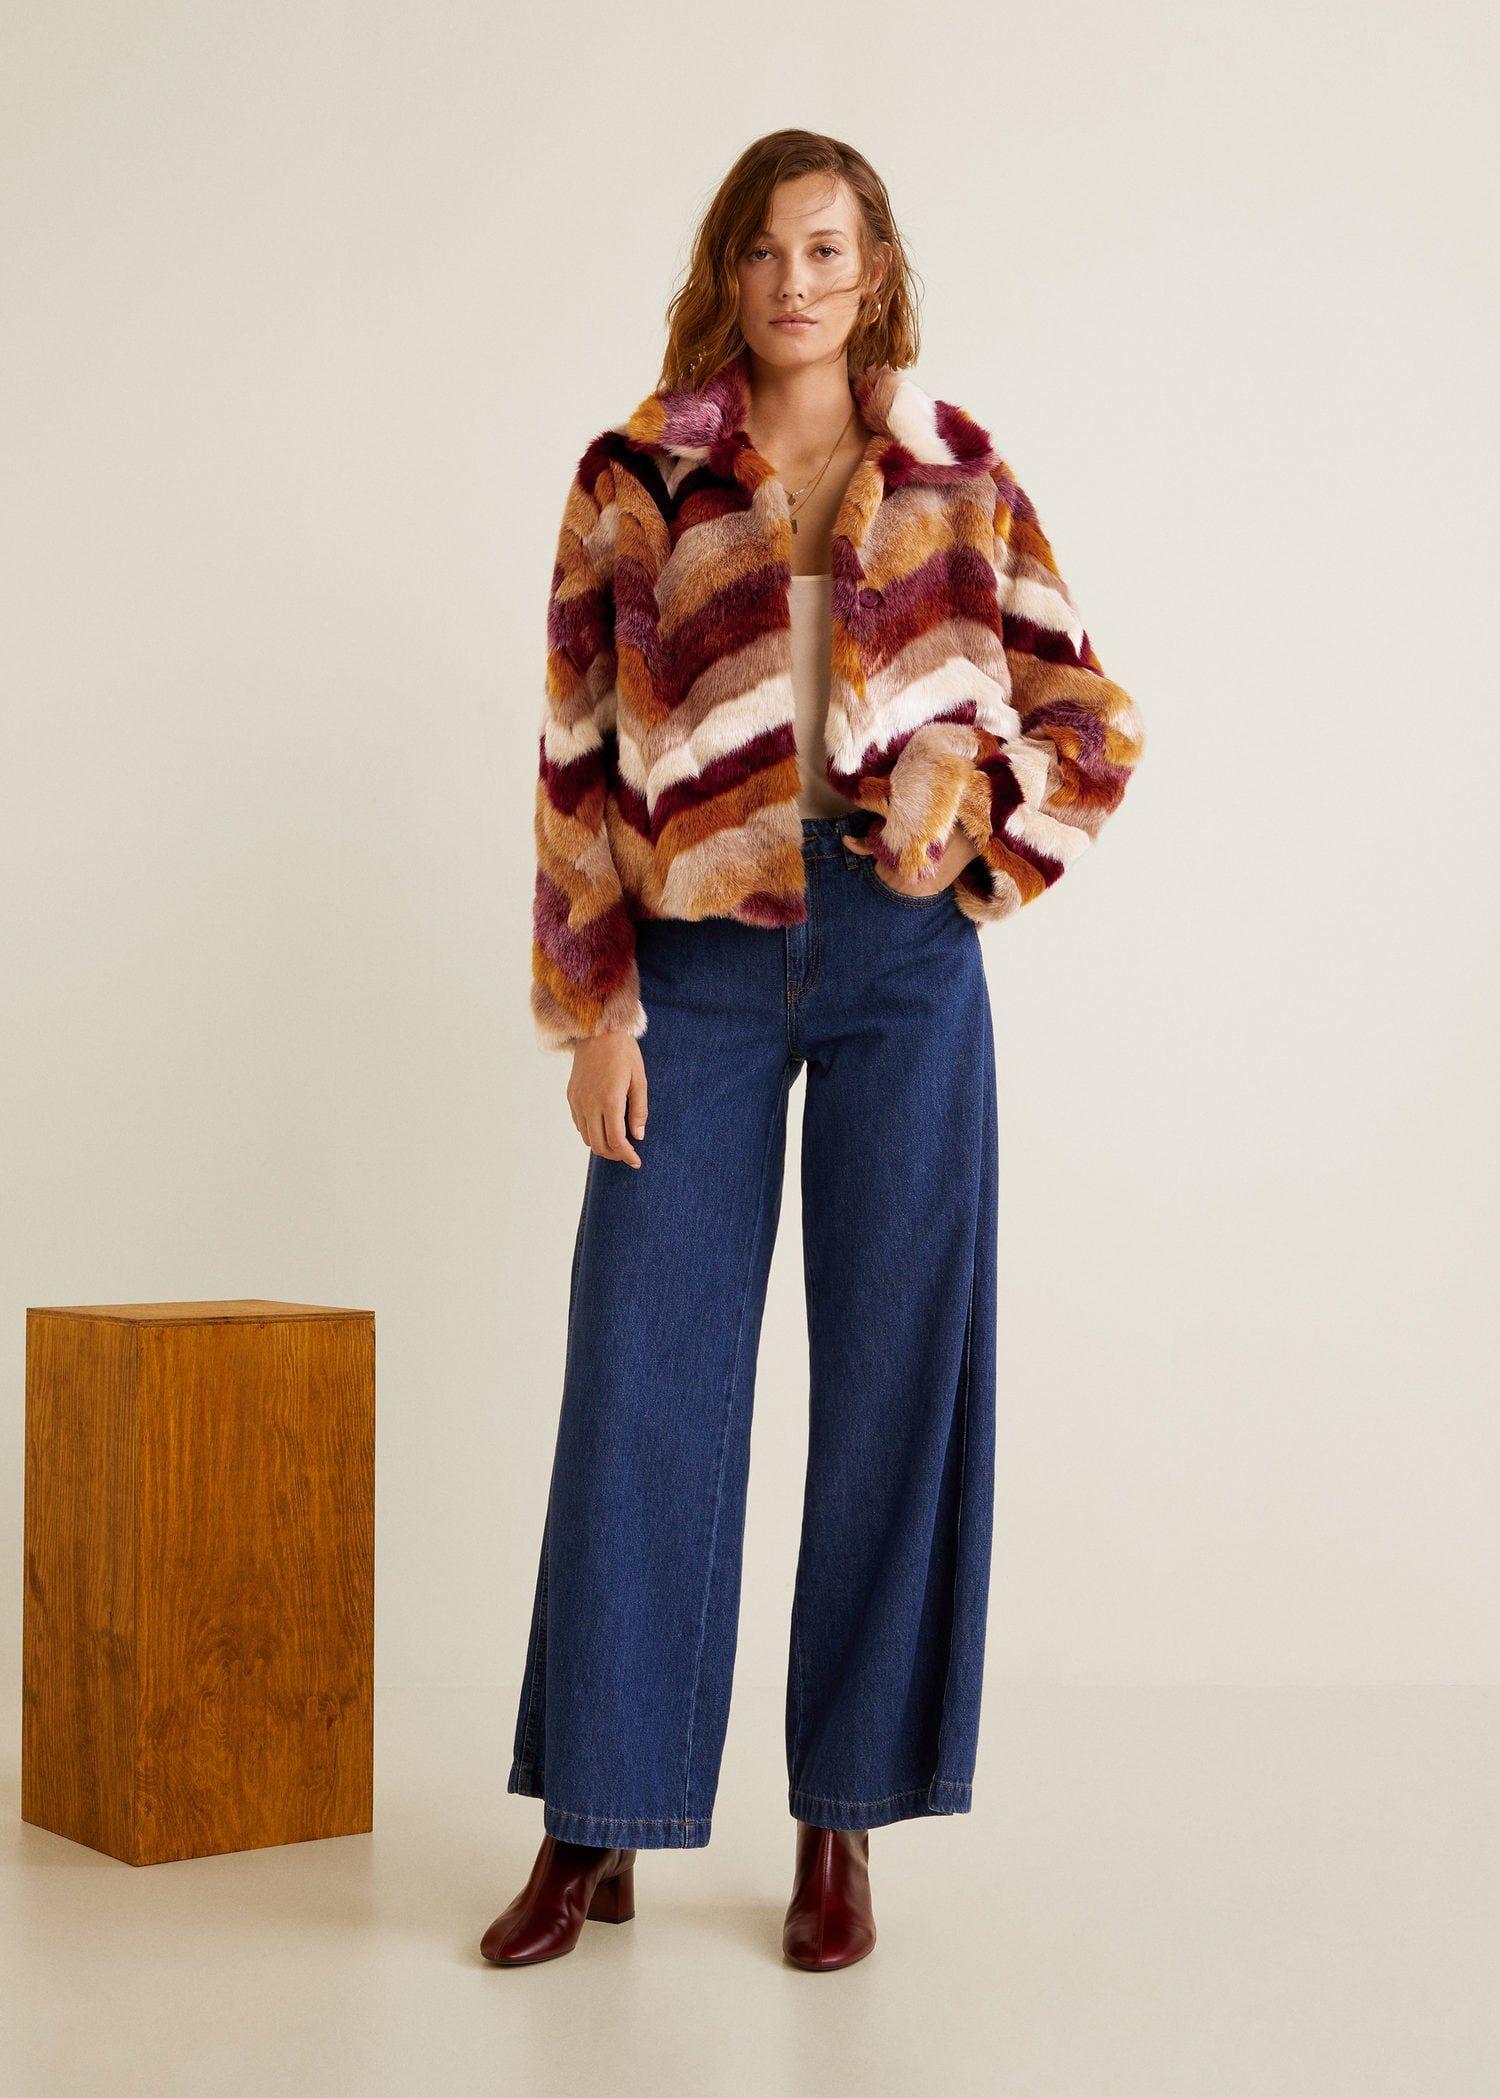 a1f1db438d Multicolor faux fur coat - Women | fall/winter fashion | Coat, Fur ...